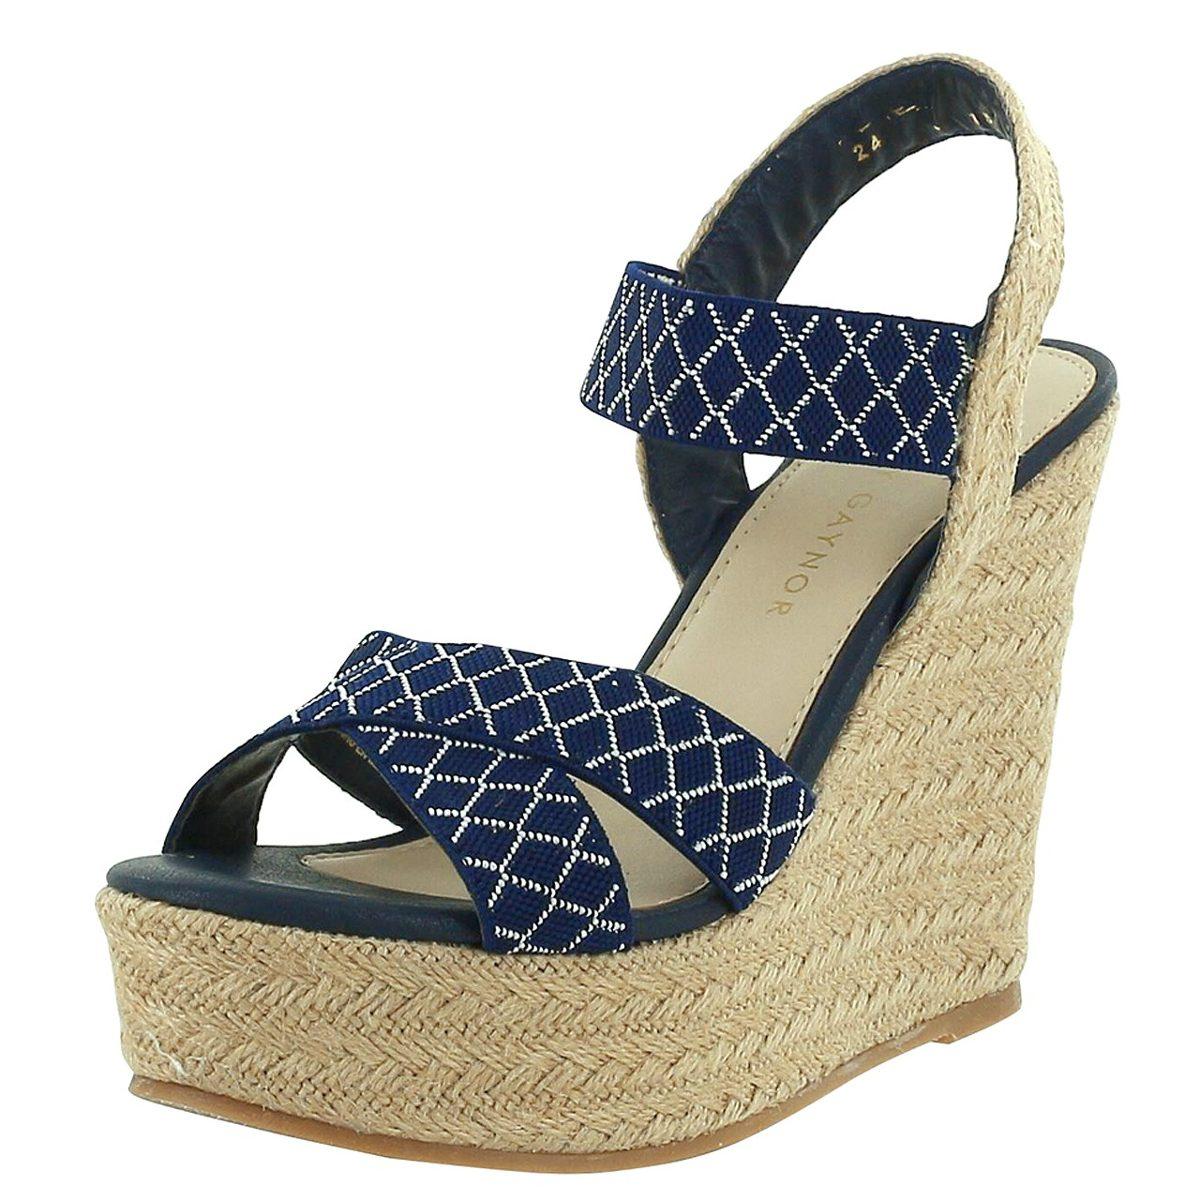 Sandalia Dama Mujer Cuña Zapato Plataforma Dorothy Gaynor -   471.00 ... c5c2d1f3926a1